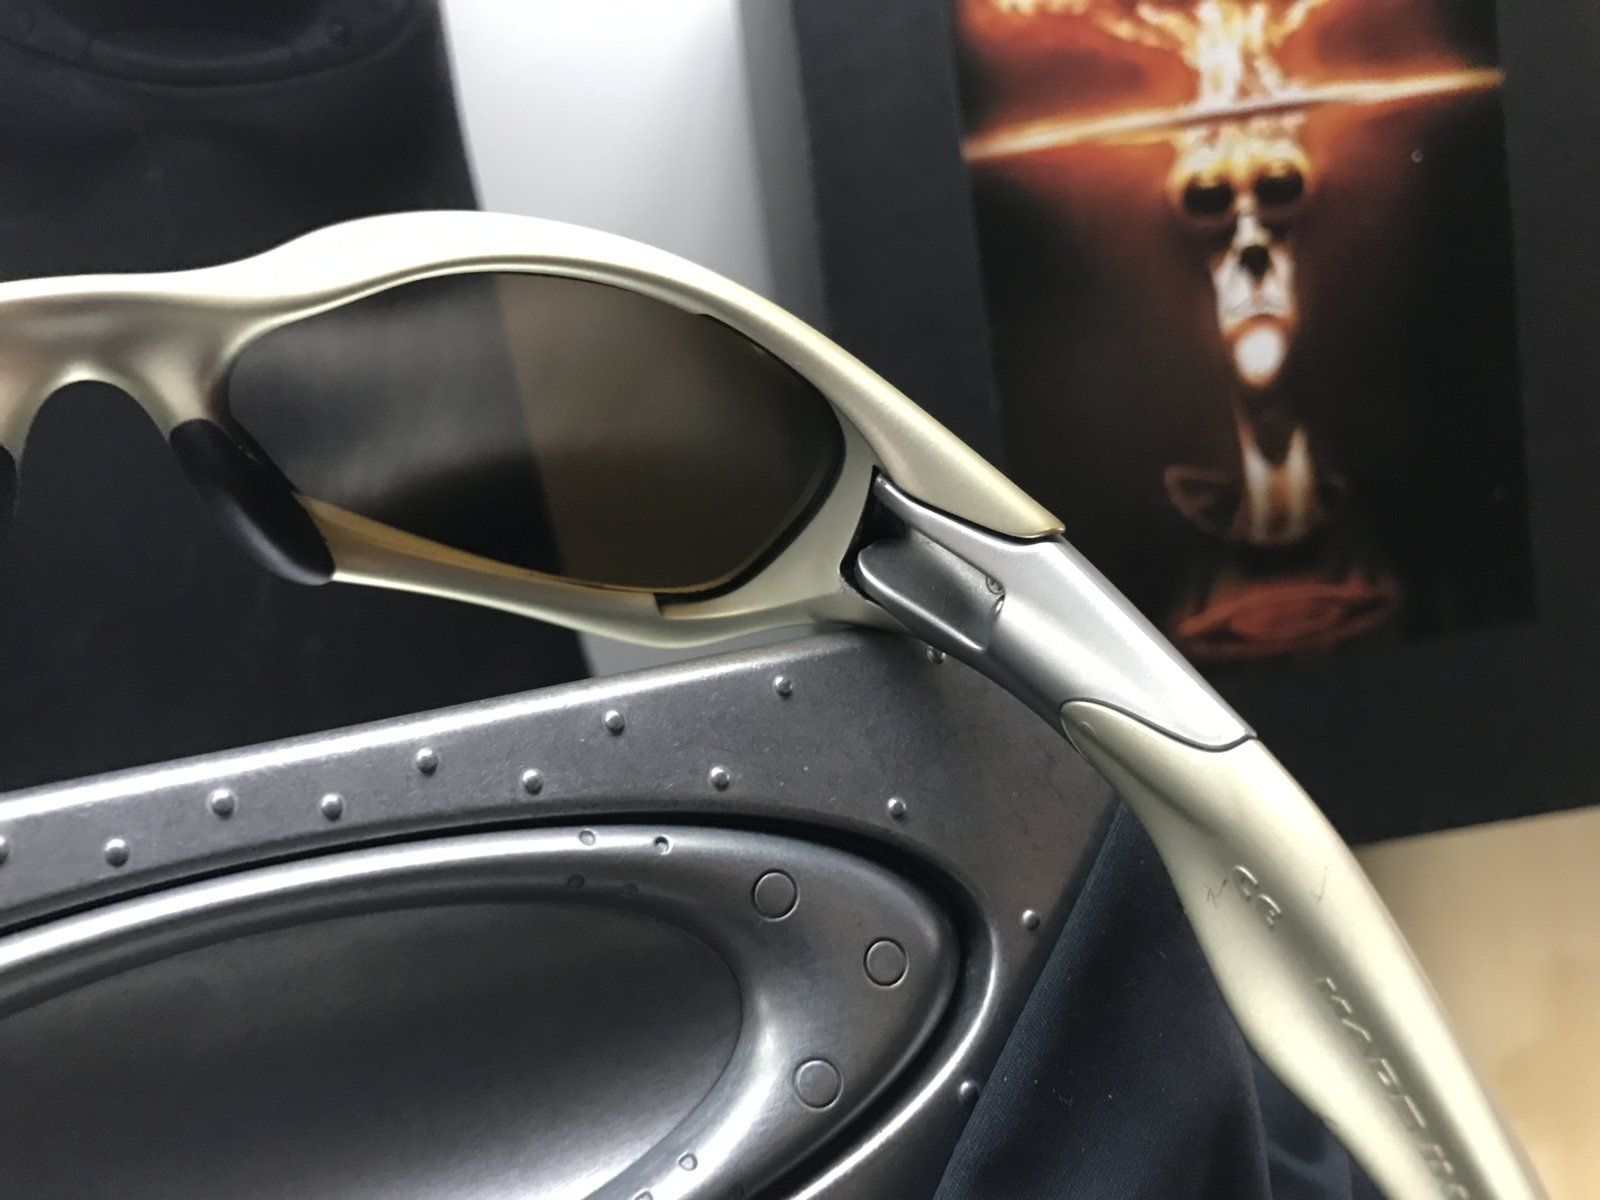 Valve FMJ Platinum - FMJ+ w/ gold iridium - $110 - IMG_6353.JPG